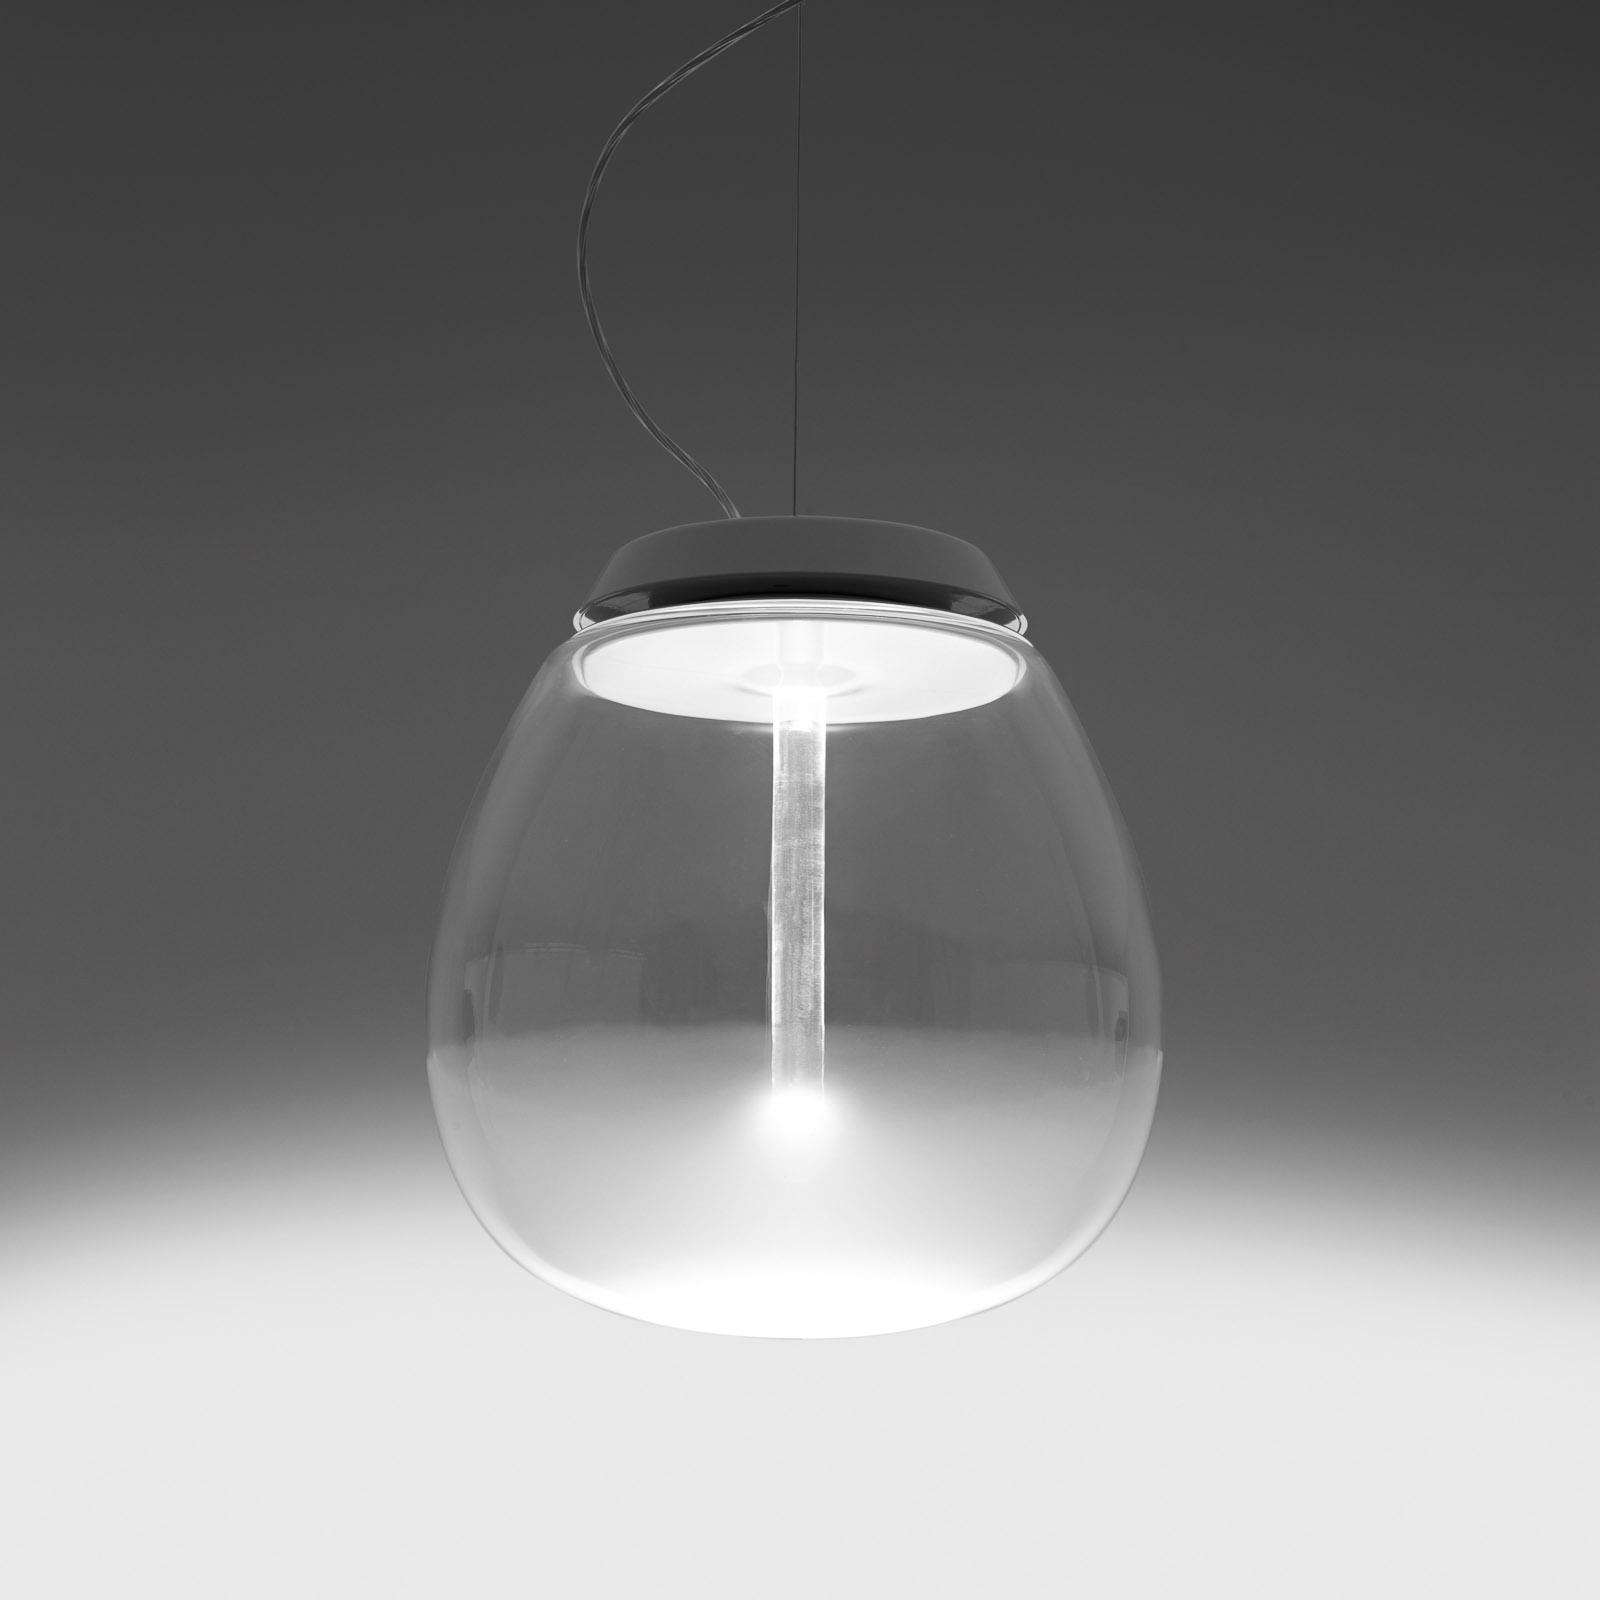 Artemide Empatia LED-Hängeleuchte, Ø 36 cm